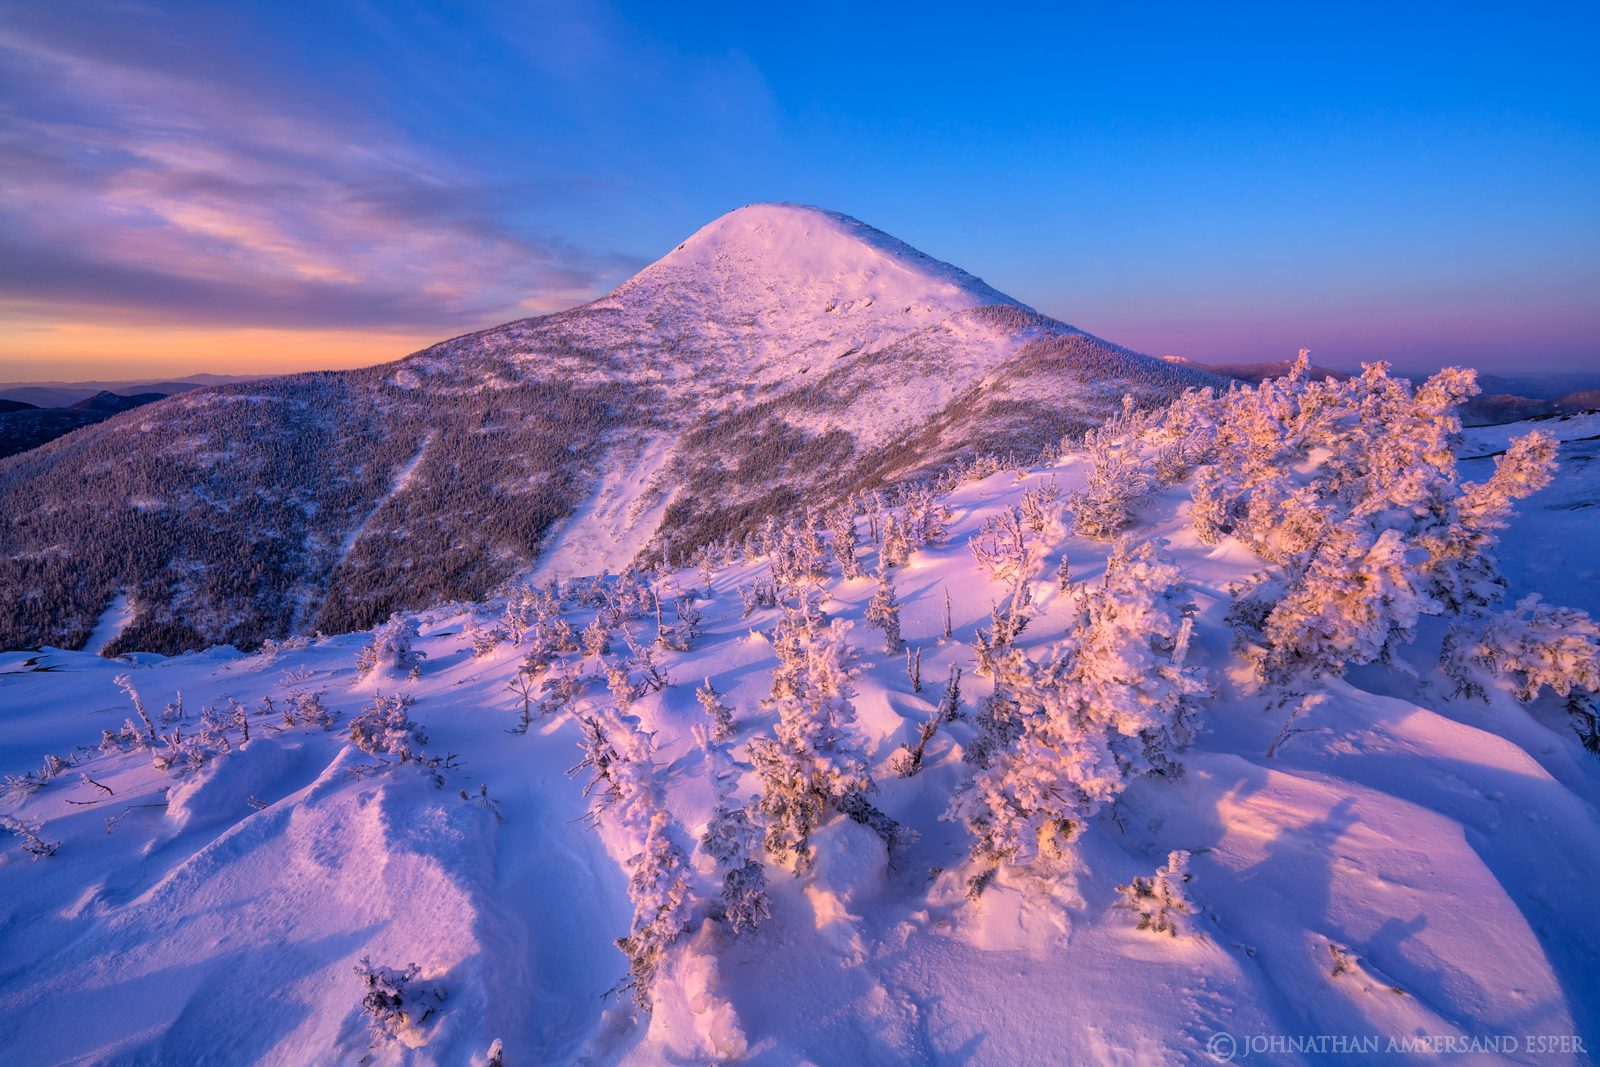 Algonquin Peak,Algonquin,High Peaks,winter 2020,2020,winter,snow,Adirondack Mountains,Adirondacks,Wright Peak,summit,summit dome...